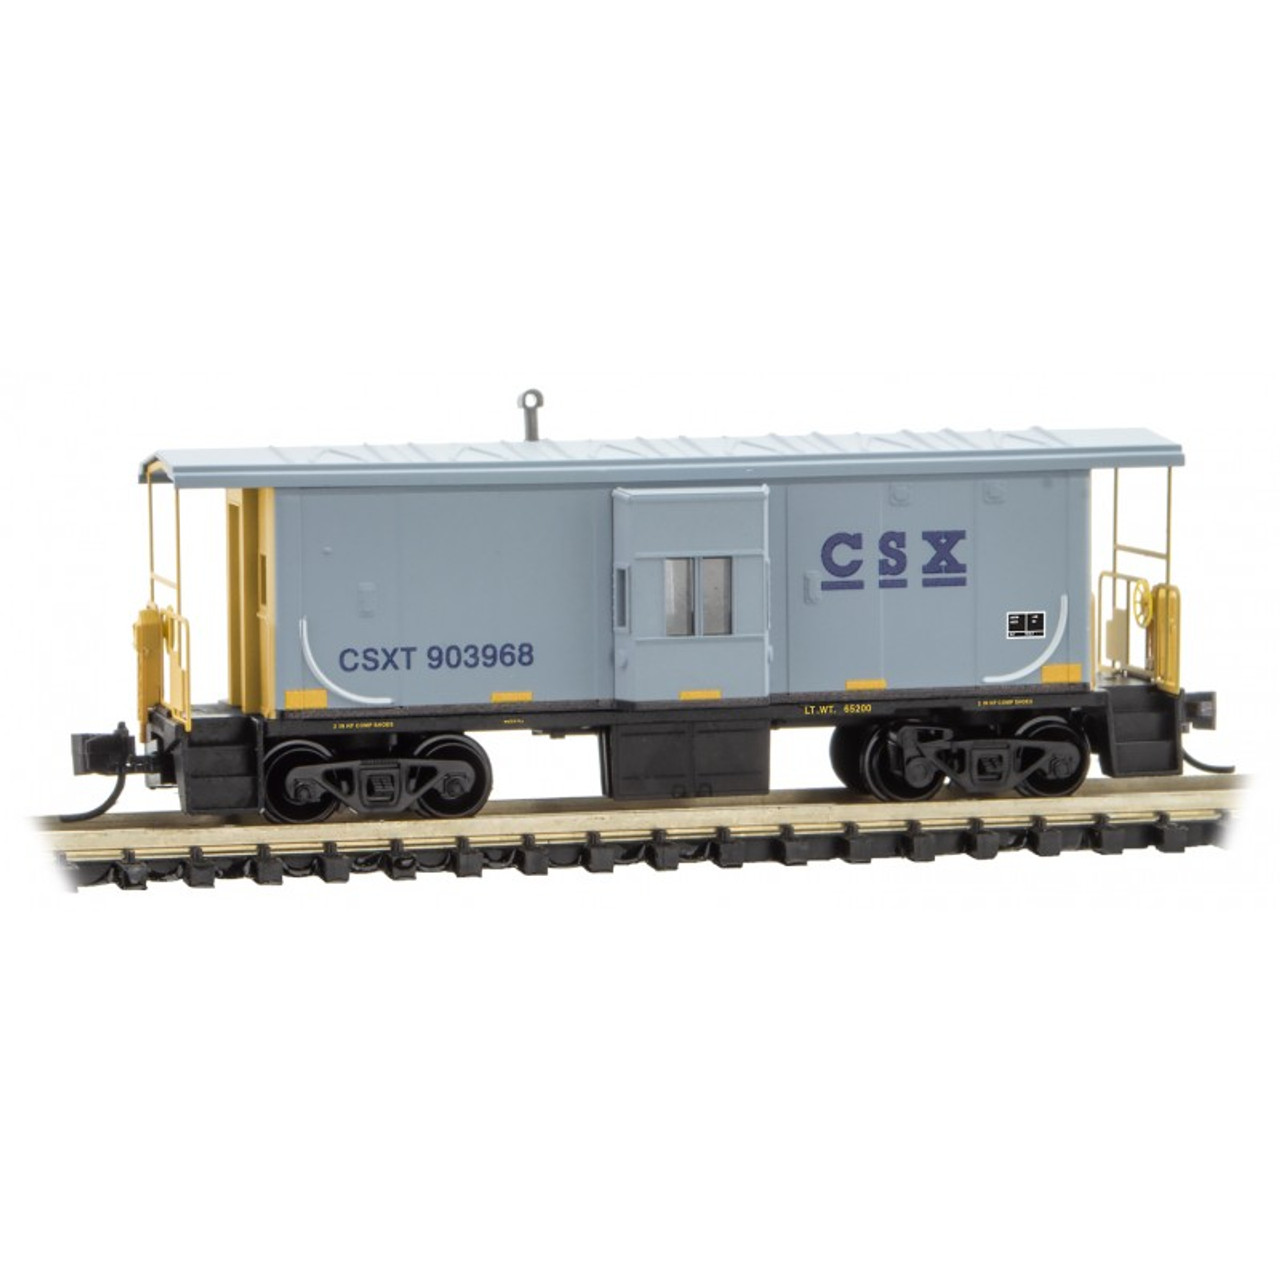 Micro-Trains 13000041 31' Bay Window Caboose CSX #903968 N Scale